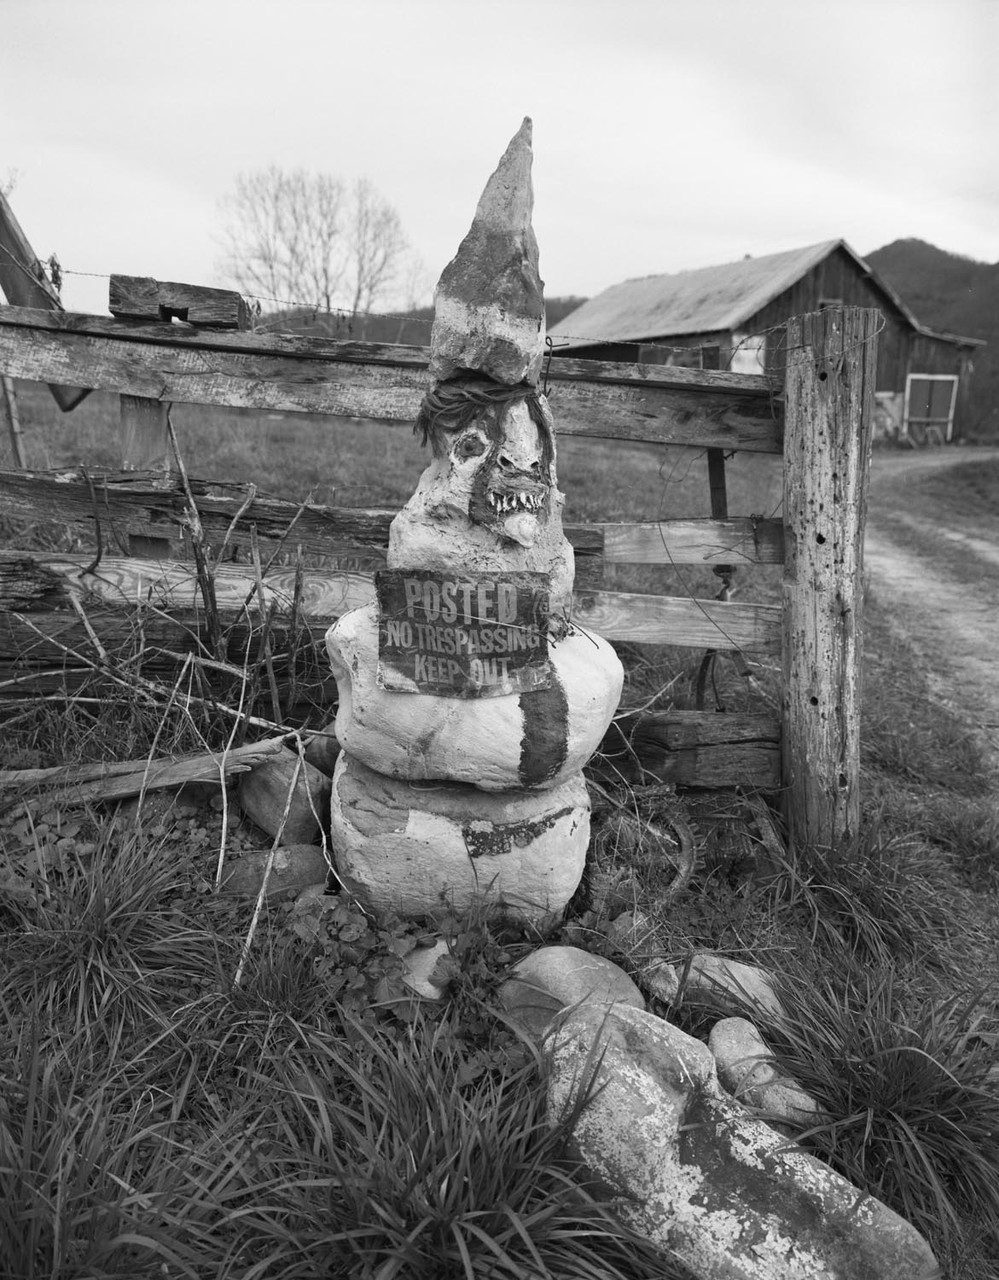 Troll, Dungannon, VA. 2015. Silver Gelatin Print.